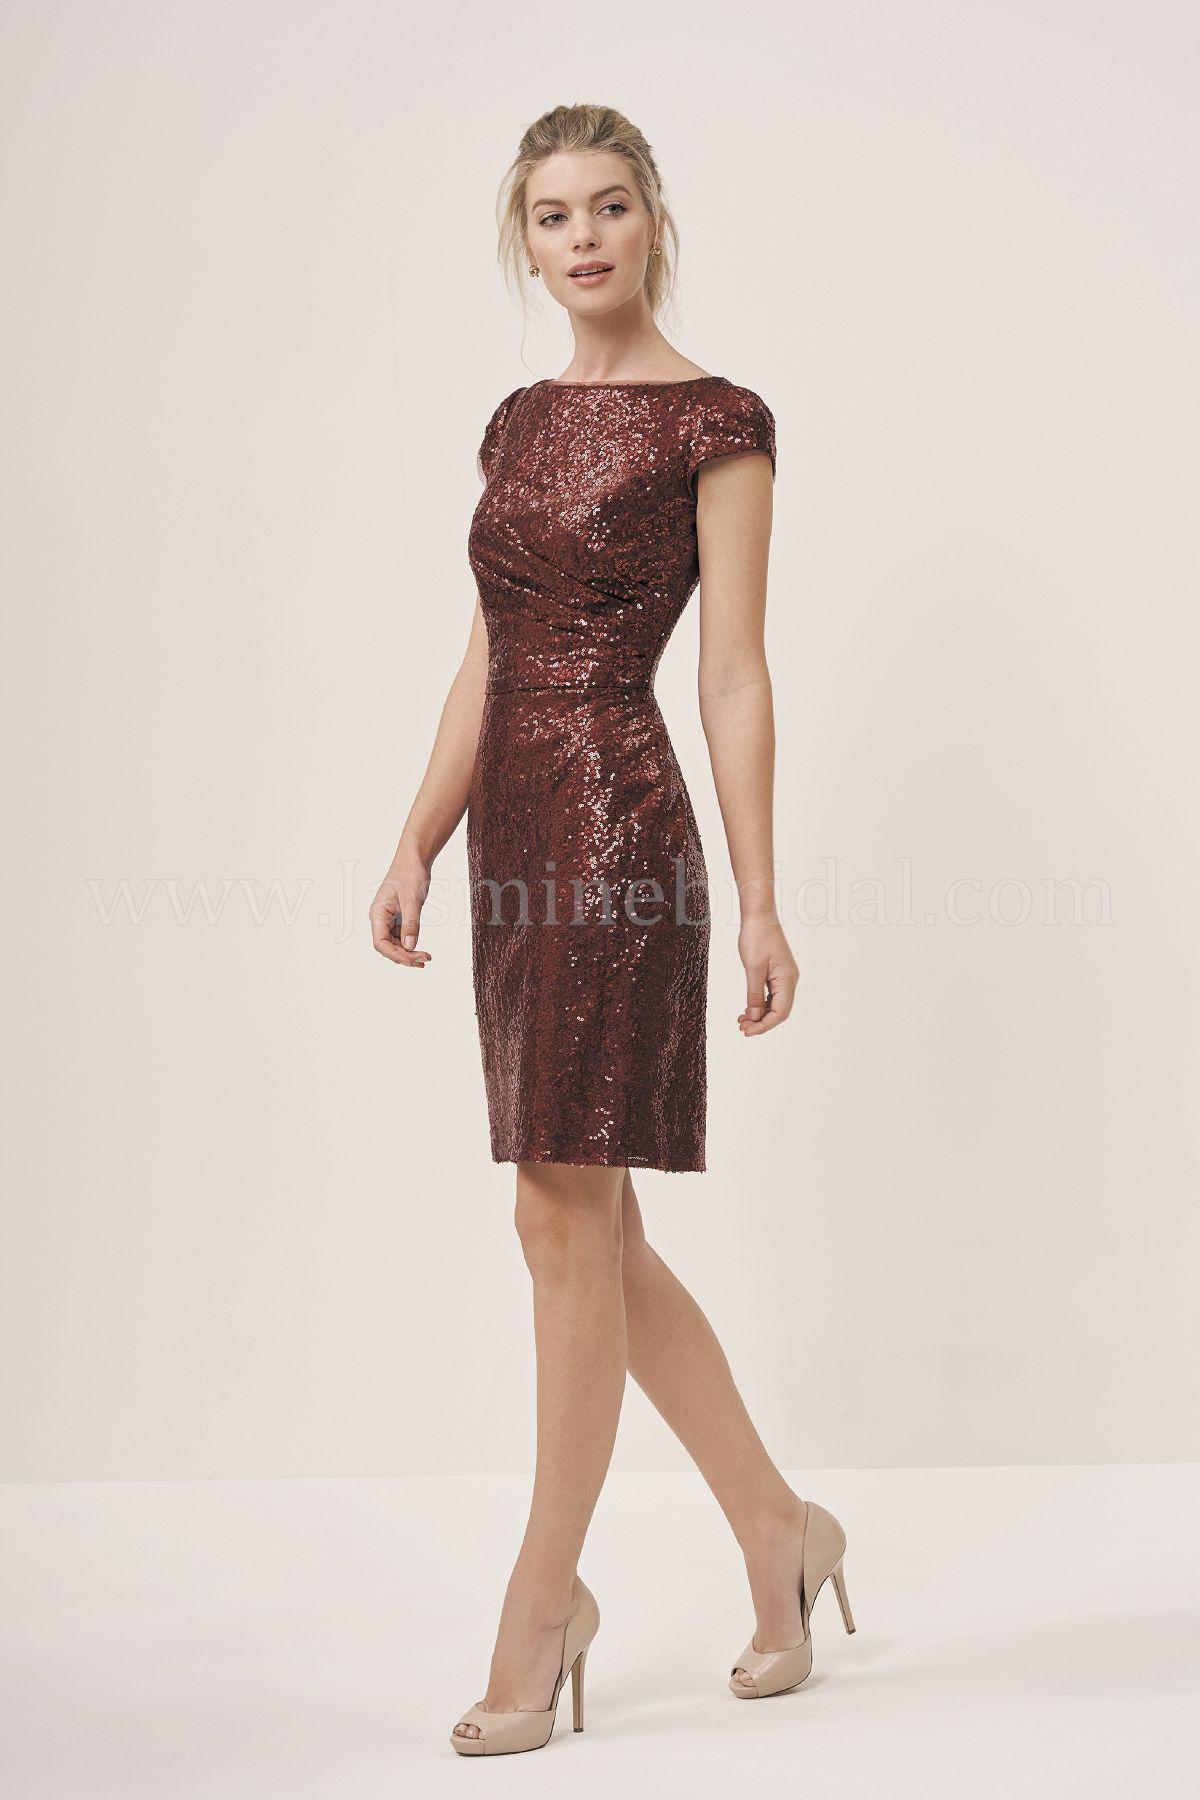 bridesmaid-dresses-P196063K-F